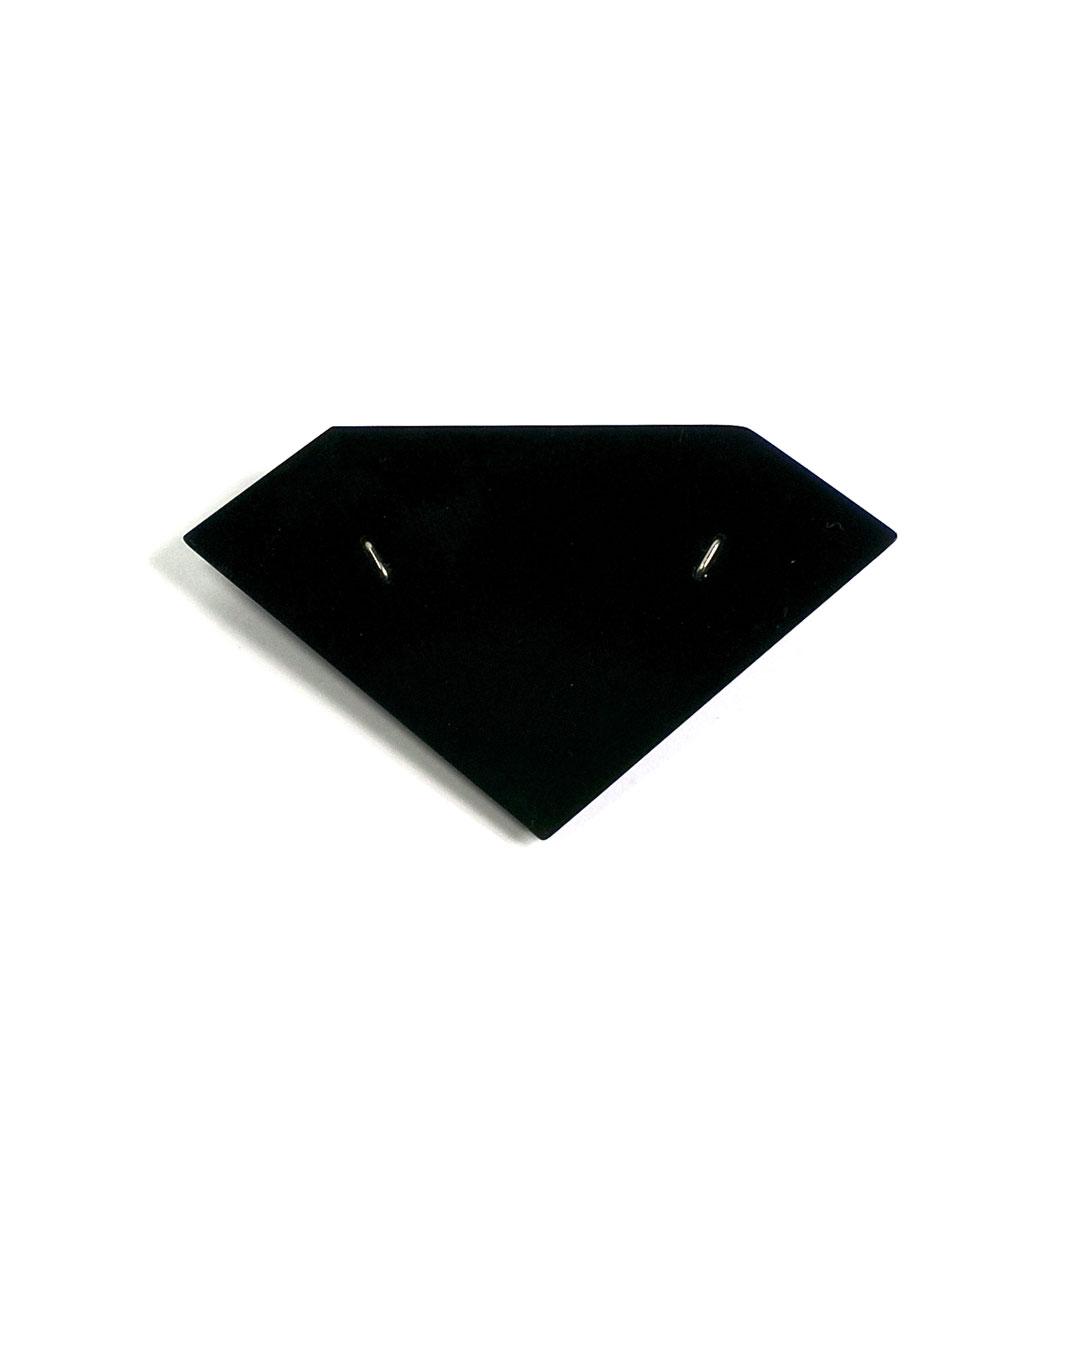 Florian Weichsberger, Forever, 2008, brooch; plastic, steel, 50 x 60 x 1 mm, €170